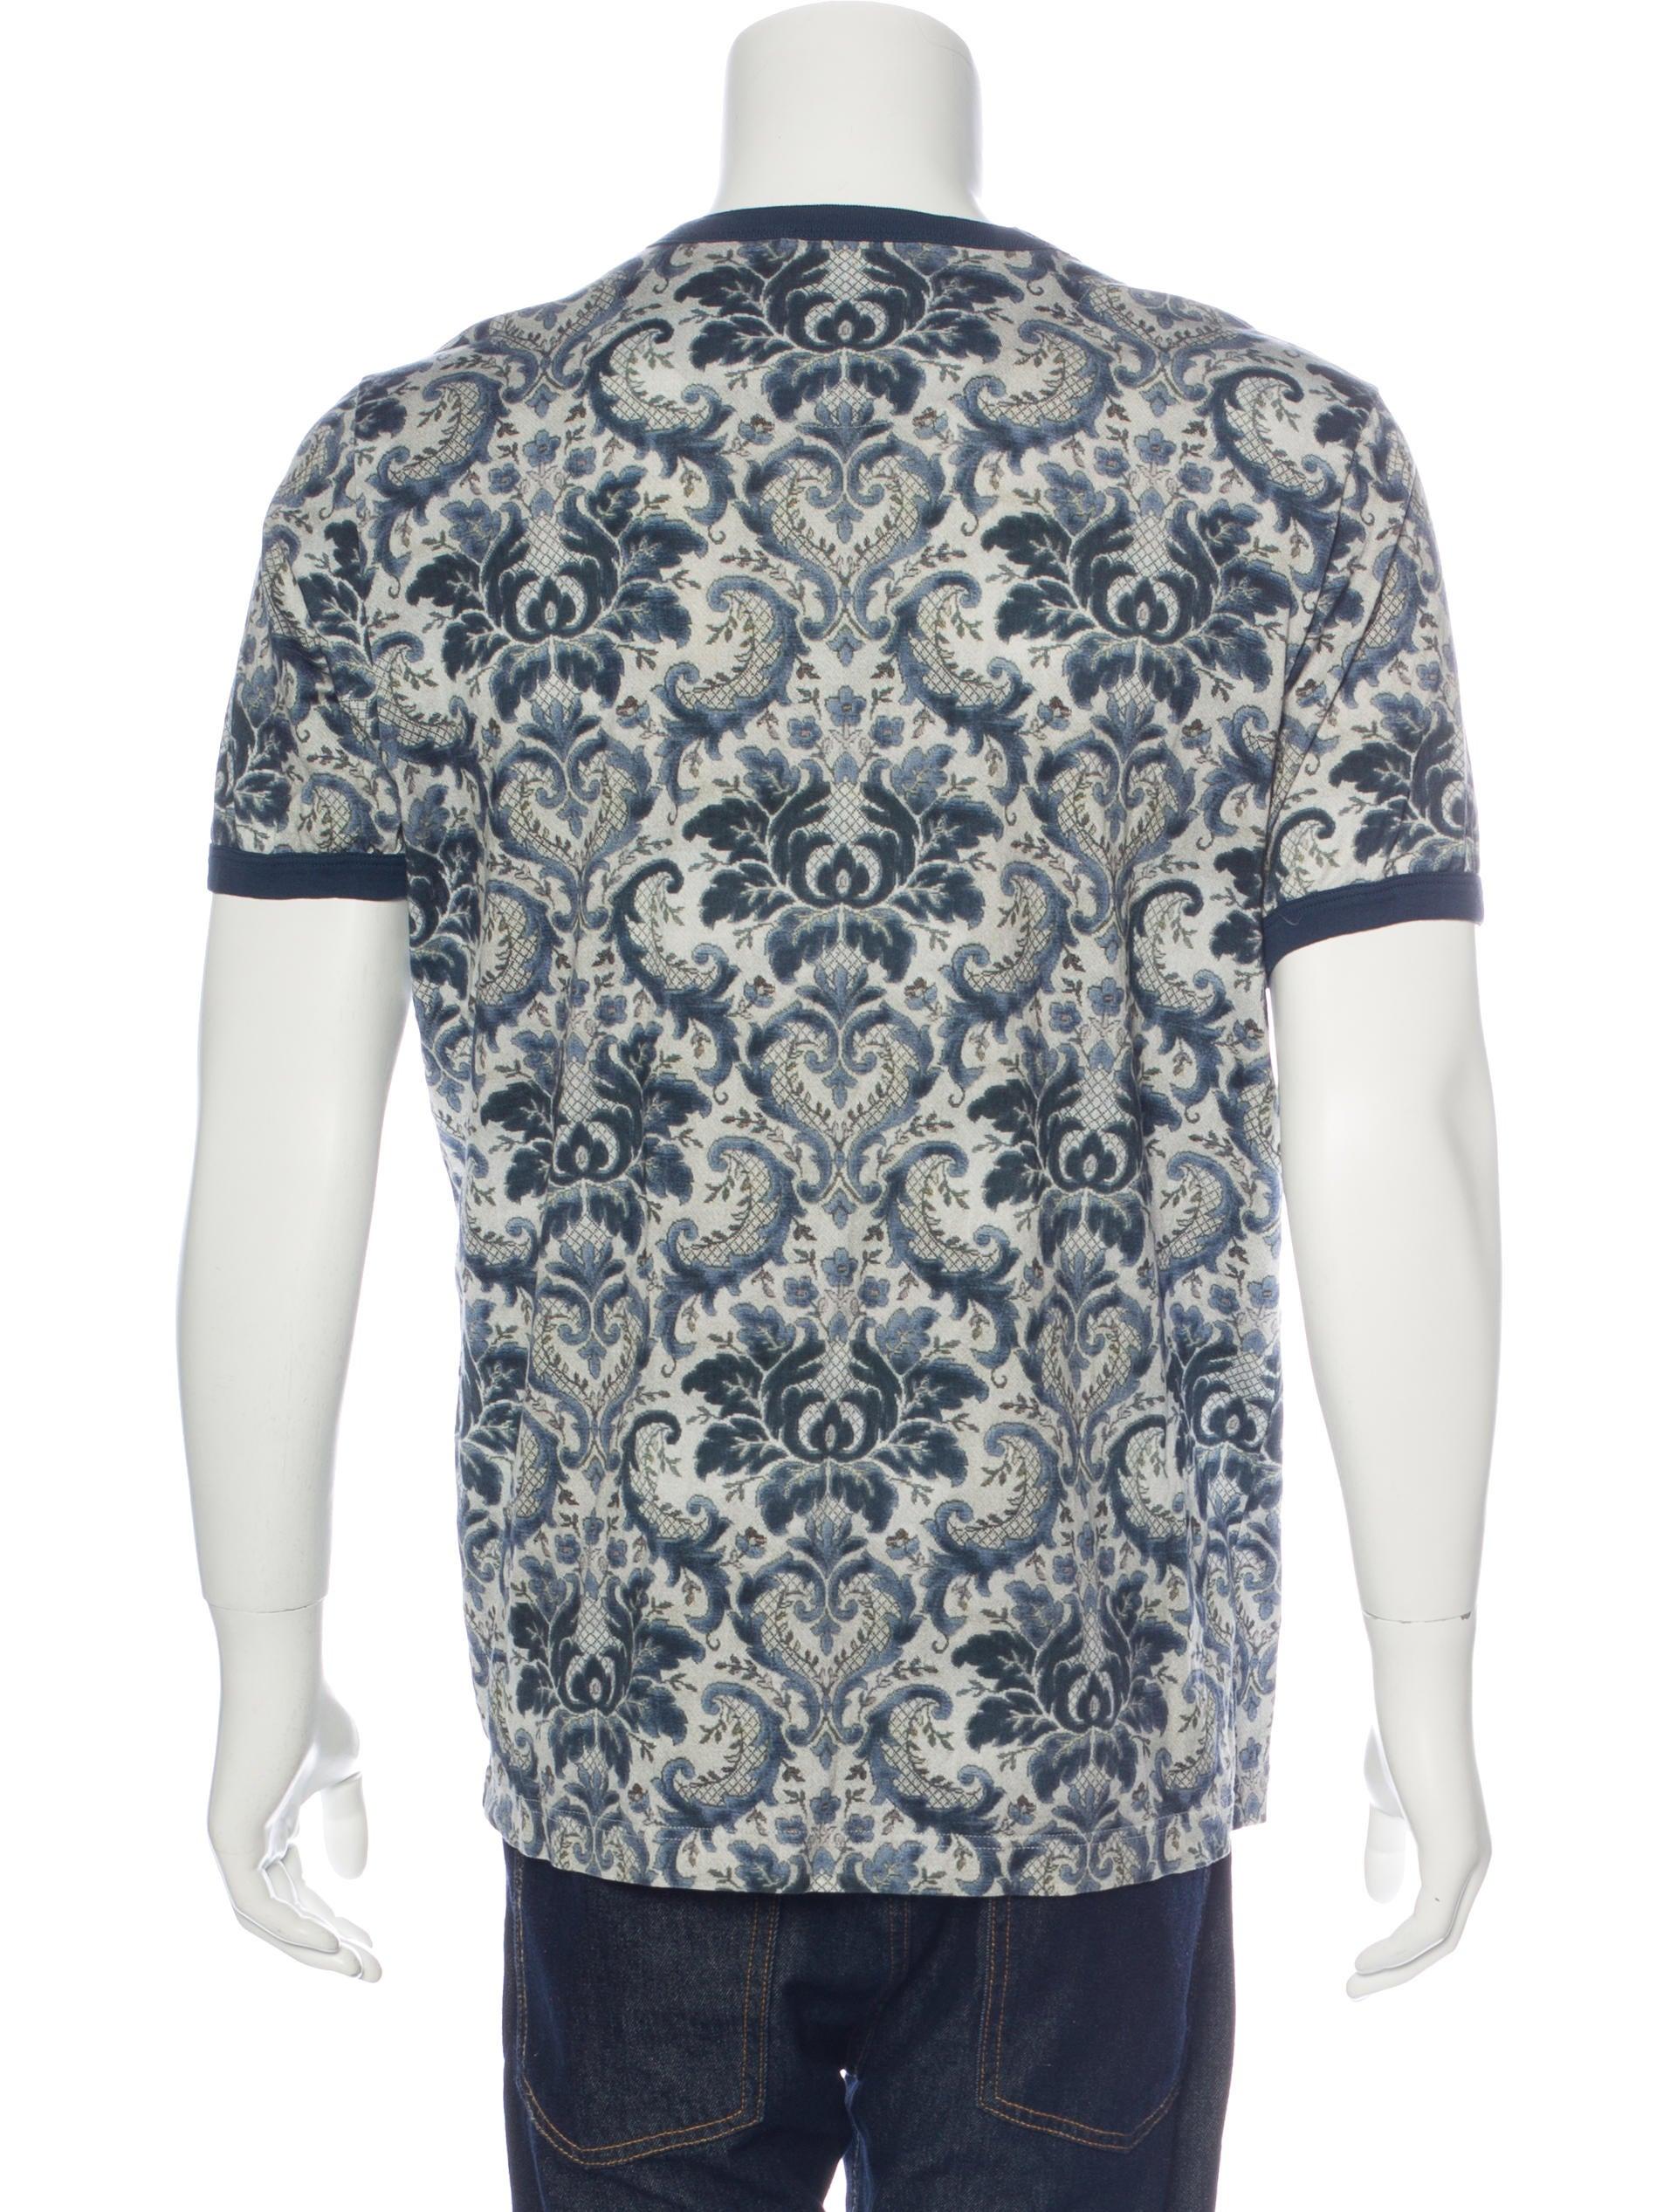 Dolce gabbana ikat print t shirt clothing dag85274 for Dolce and gabbana printed t shirts